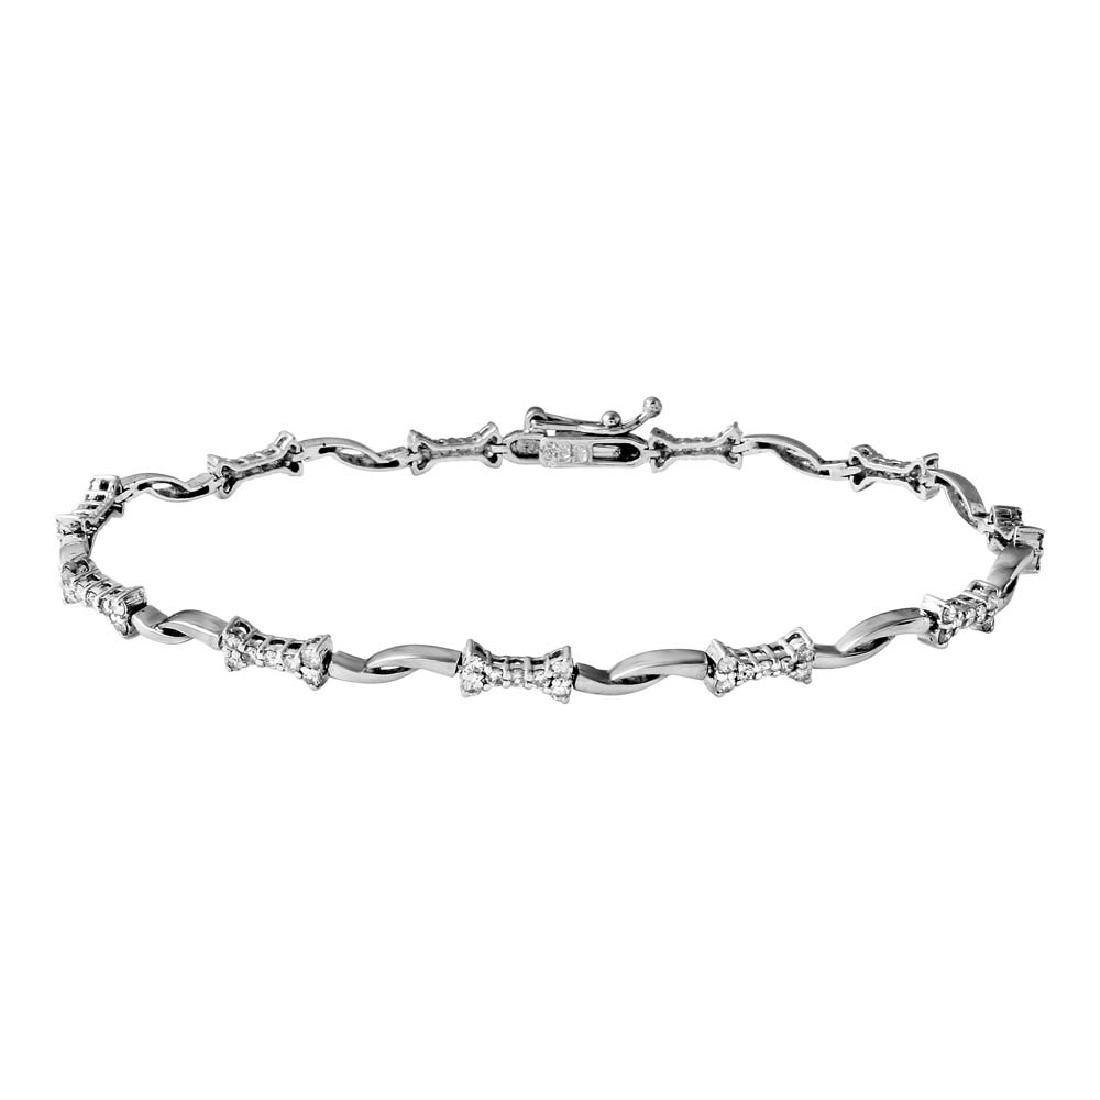 Genuine 0.8 TCW 18K White Gold Ladies Bracelet